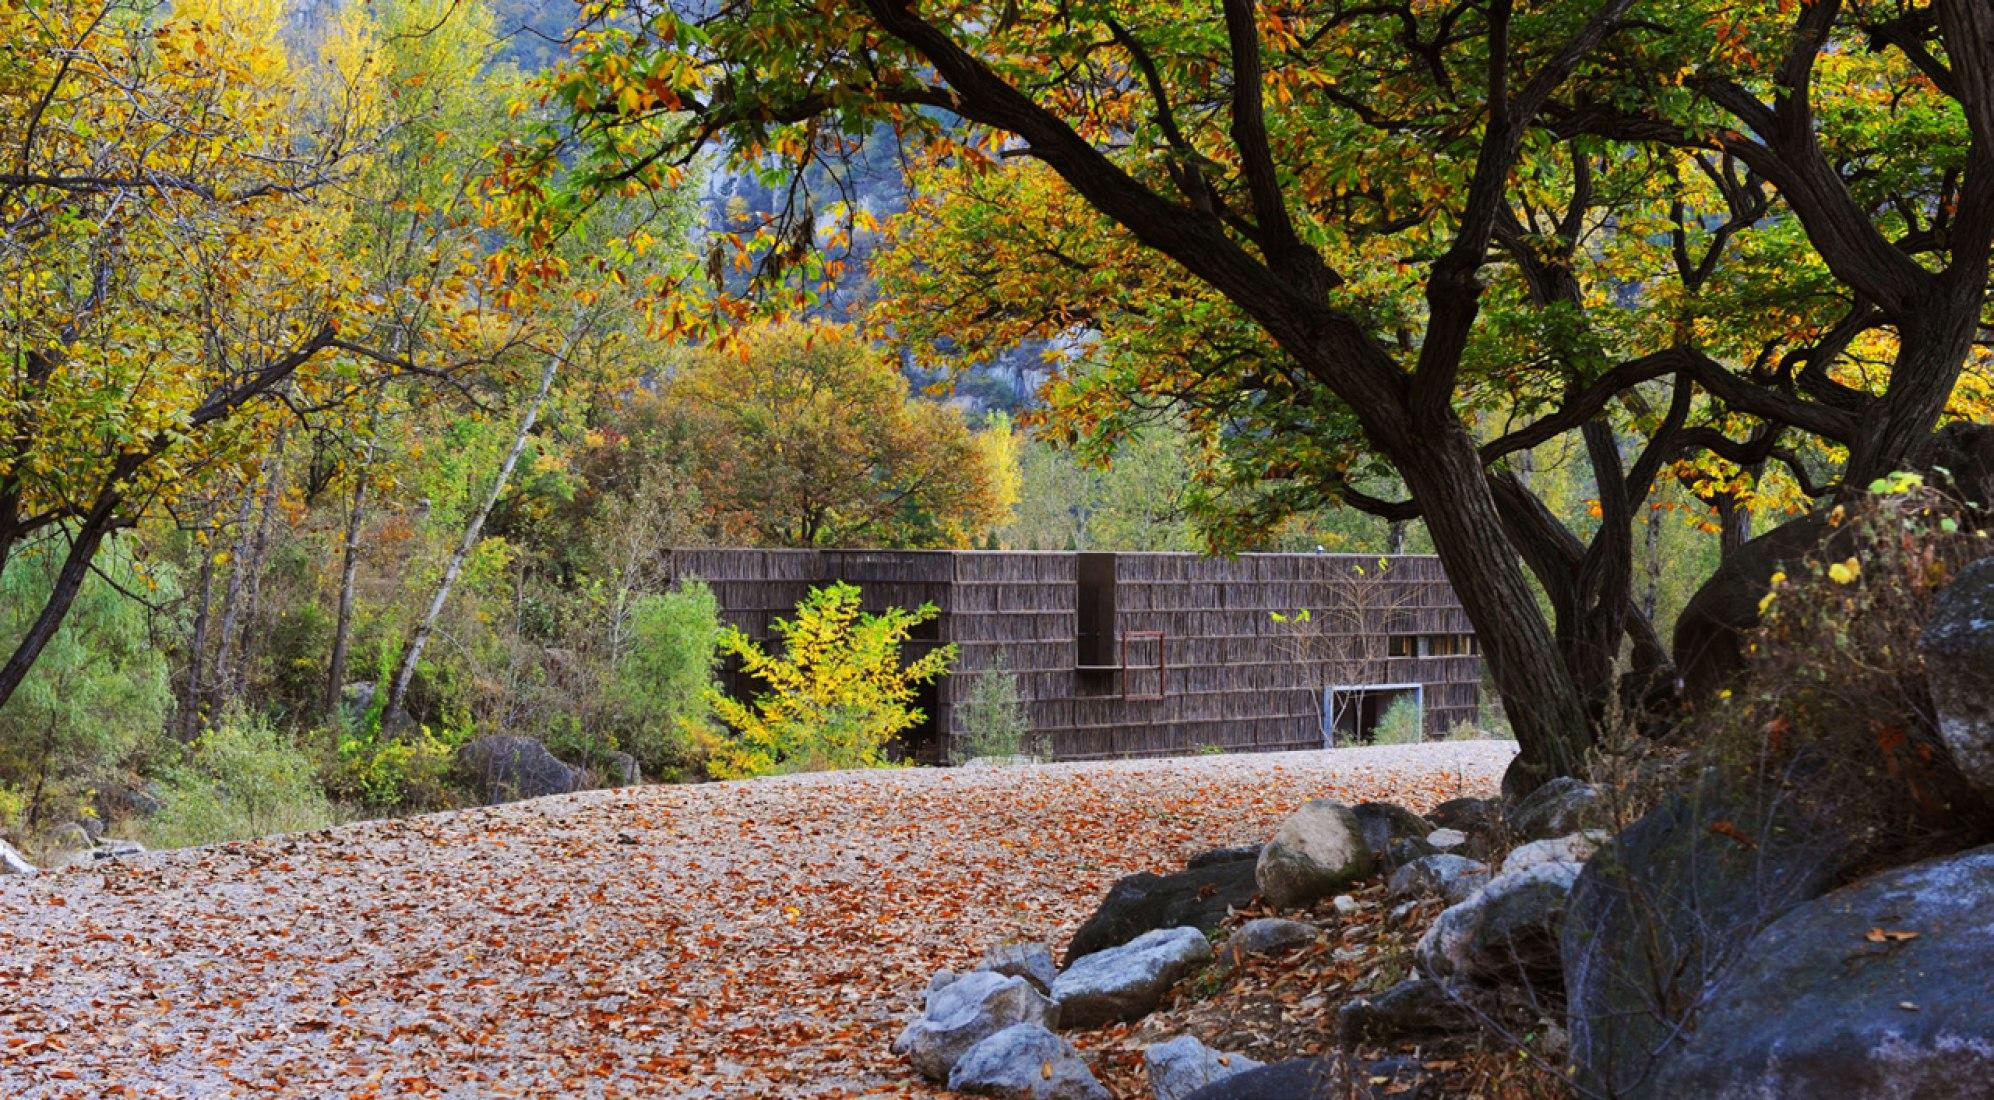 Liyuan Library by Li Xiaodong. Photography © courtesy of Moriyama RAIC International Prize.